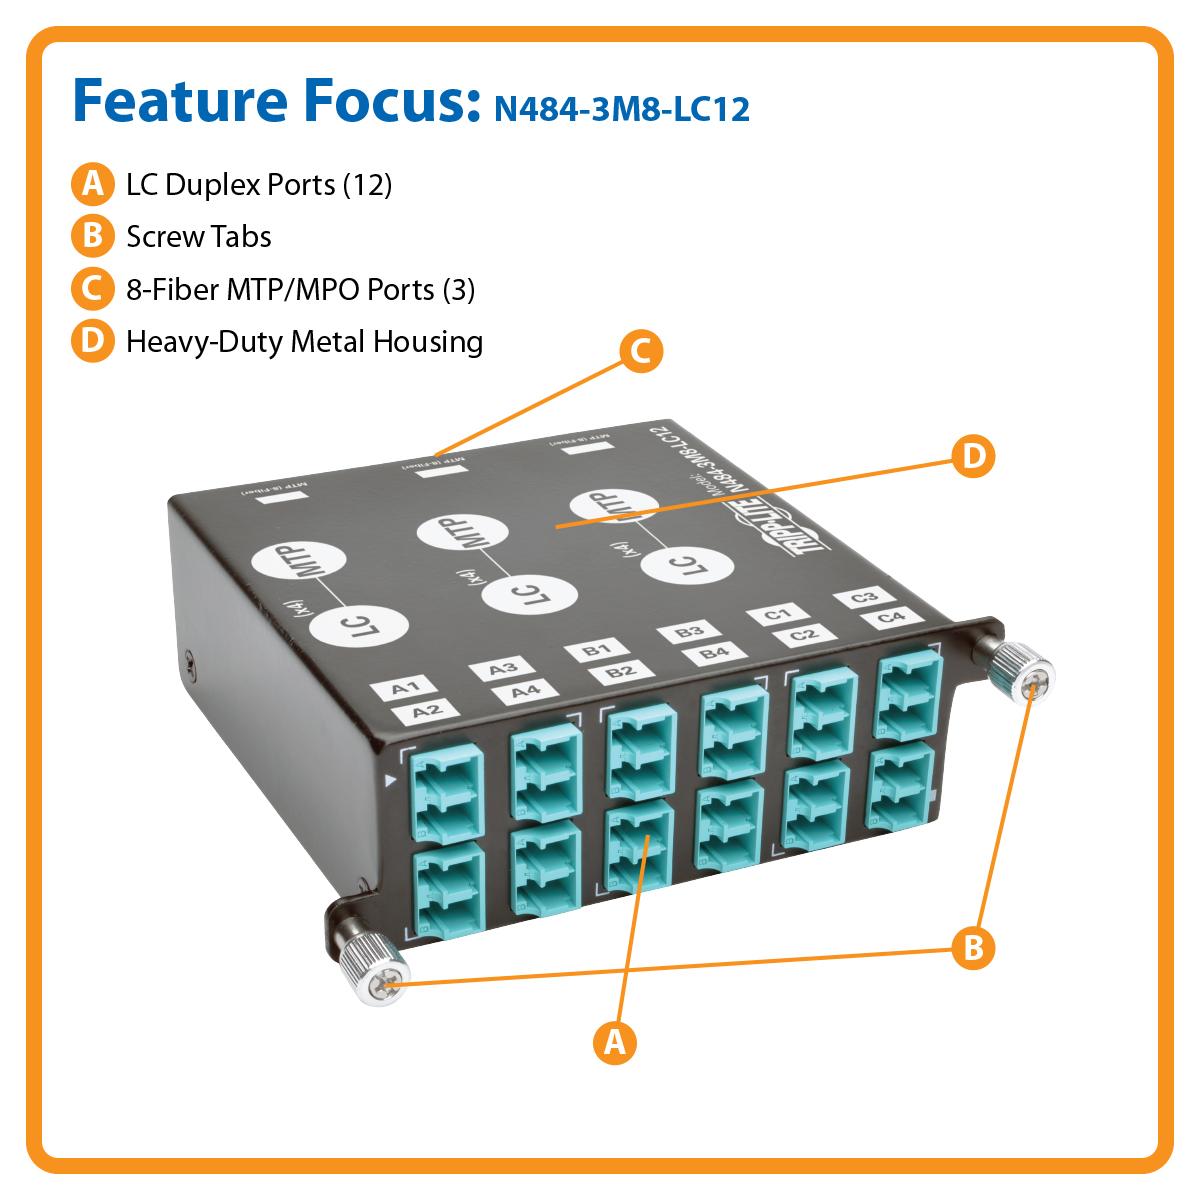 Tripp Lite 40 Gb To 10 Breakout Cassette X3 8 Fiber Om4 Mtp Plenum Optic Cable Gigabit Ethernet Qsfp 40gbasesr4 Mpo X12 Lc Duplex Canada